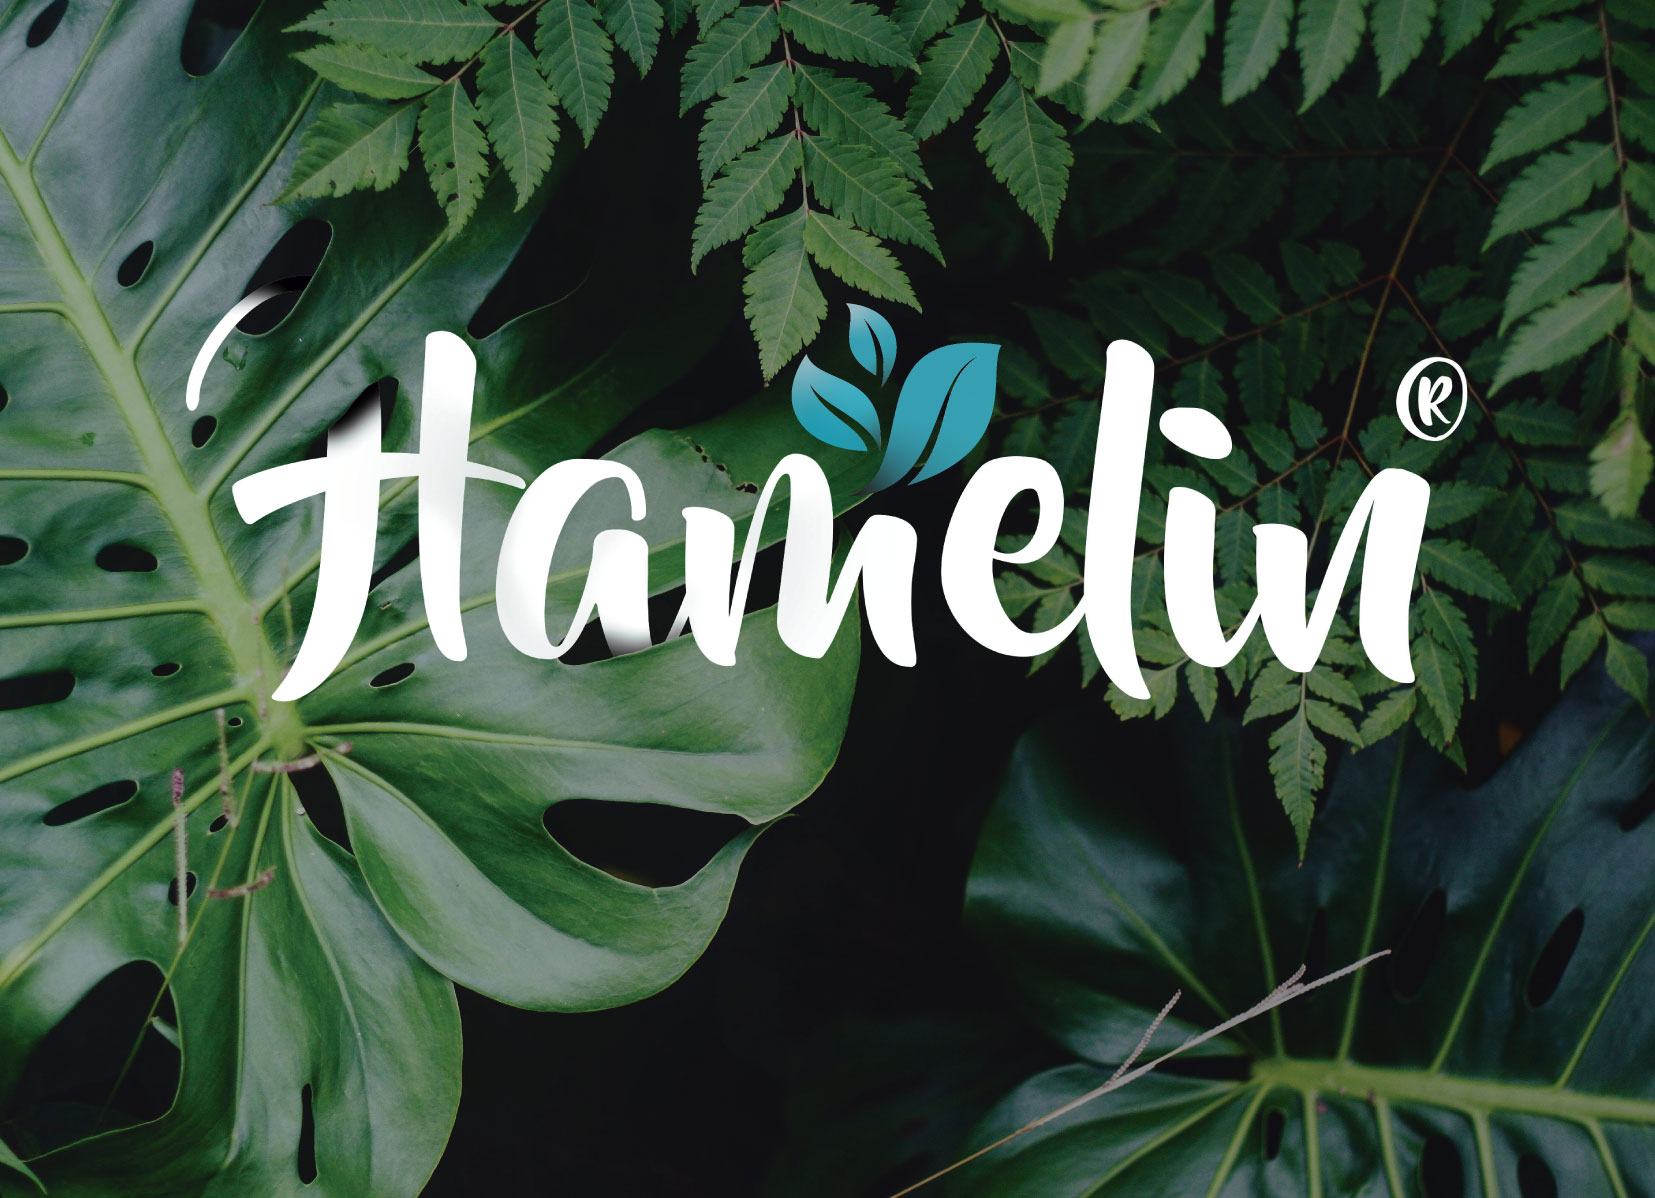 Usuario en Hamelin: nicolasgarzontrujillo - Usuario